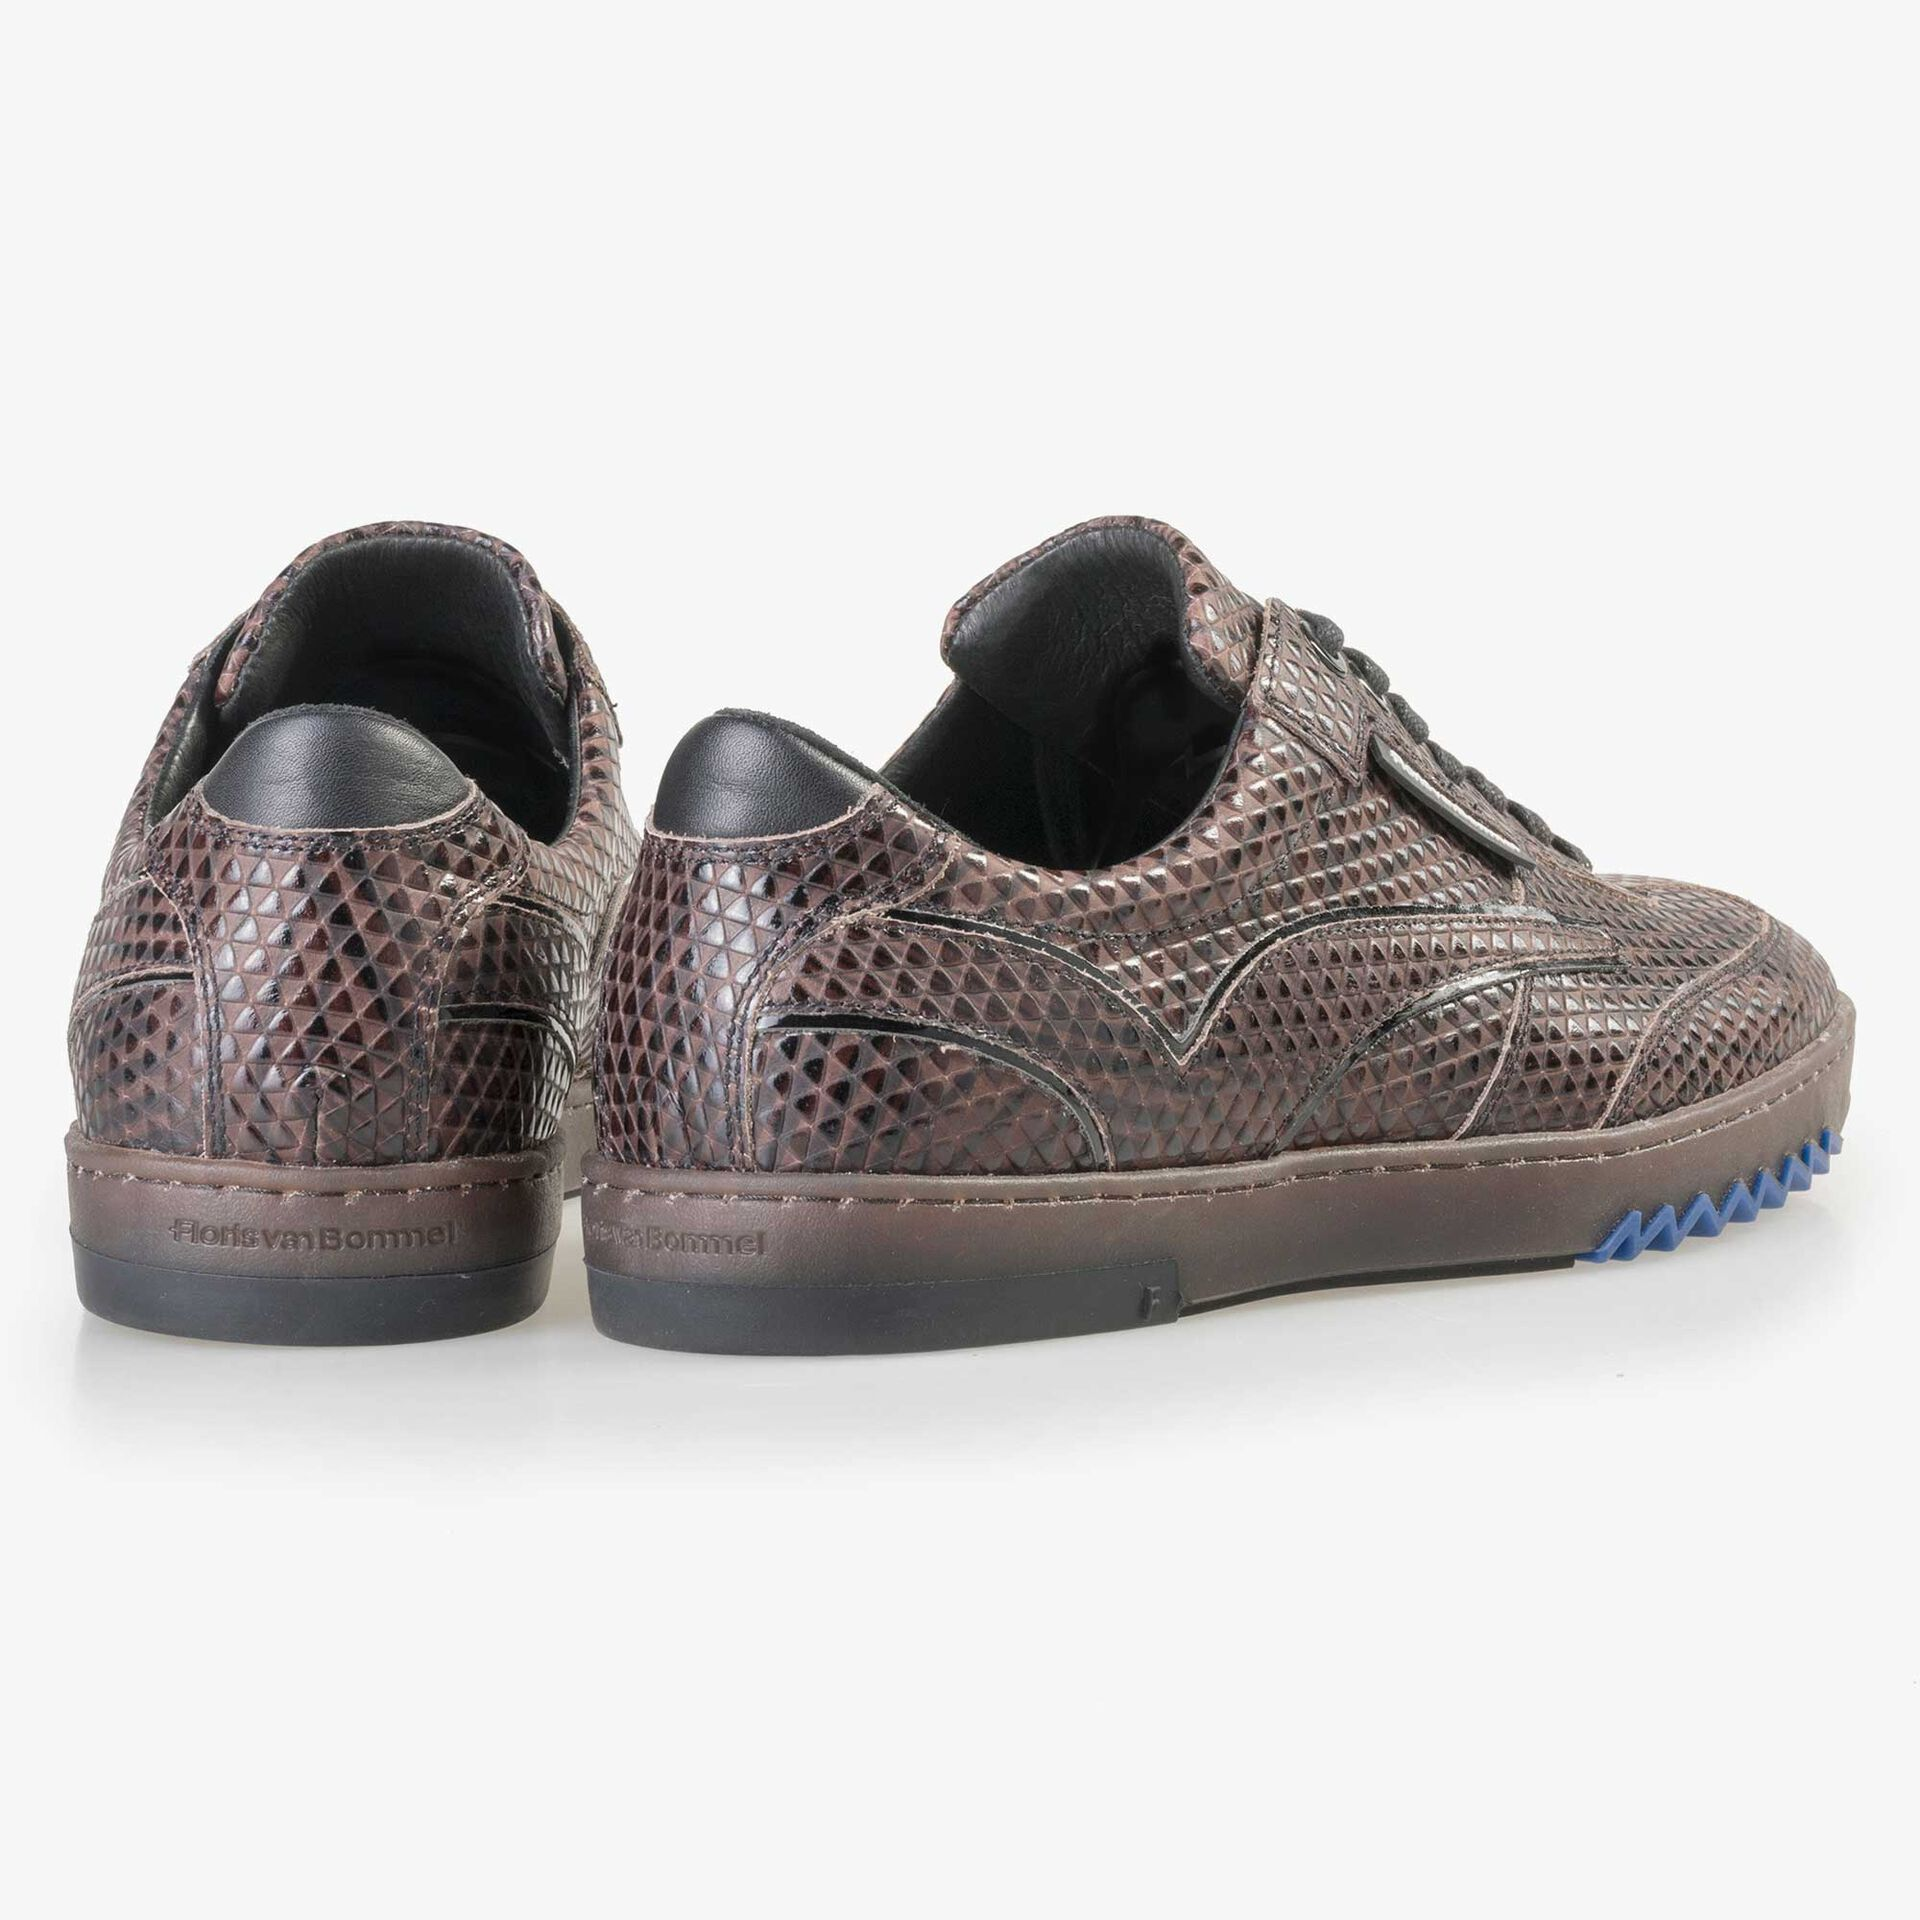 Floris van Bommel men's brown sneaker with a triangular print